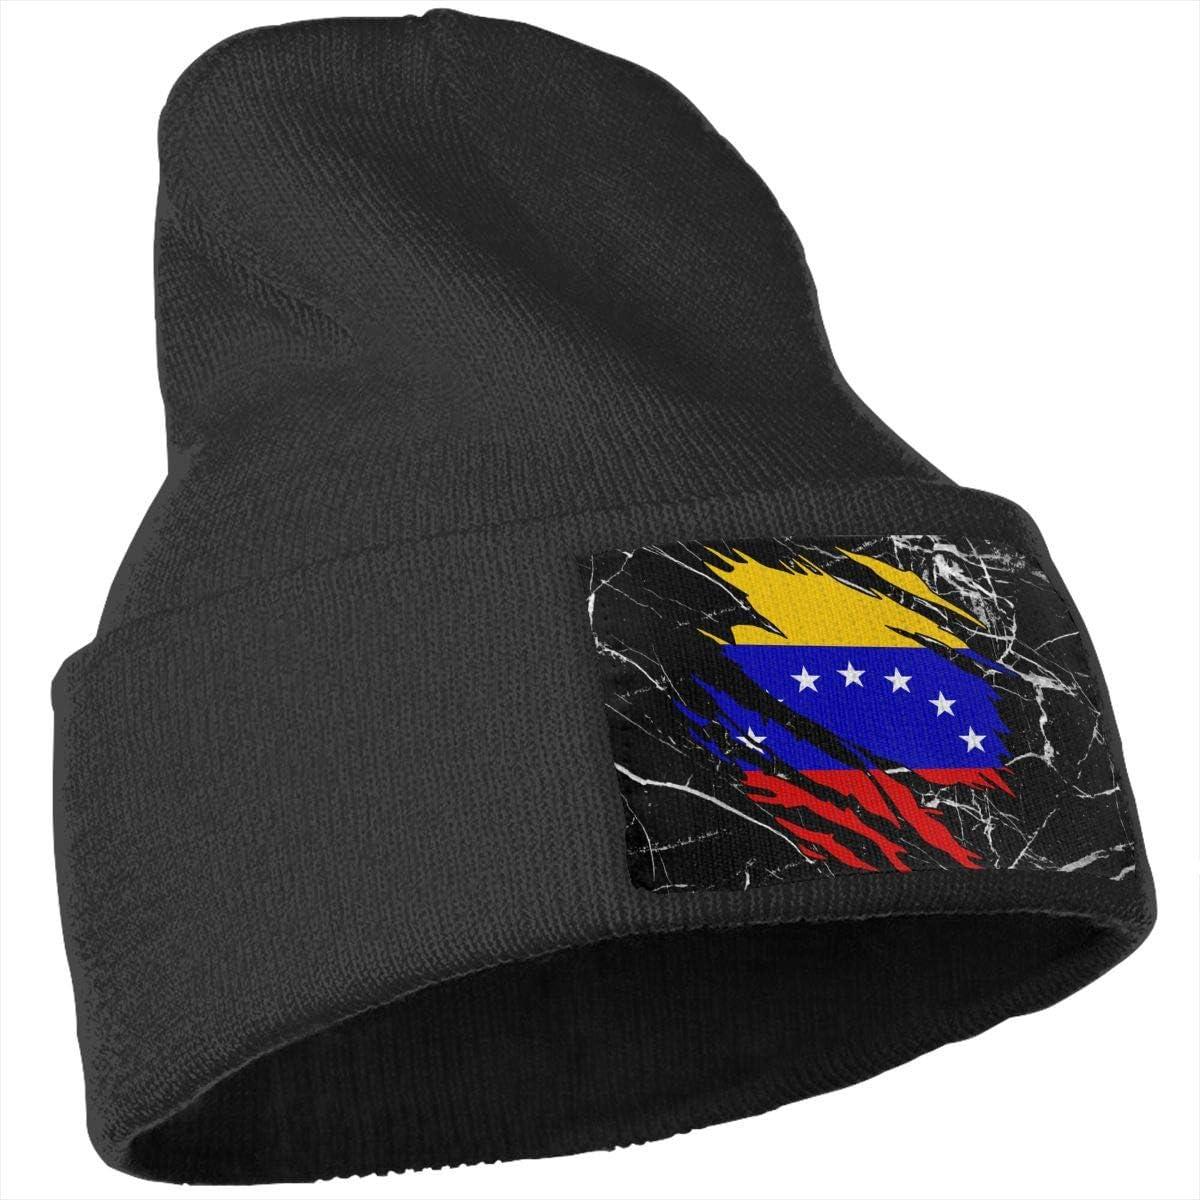 Ripped Venezuela Flag Men Womens Solid Color Knit Beanie Hat Stretchy /& Soft Winter Ski Knit Cap